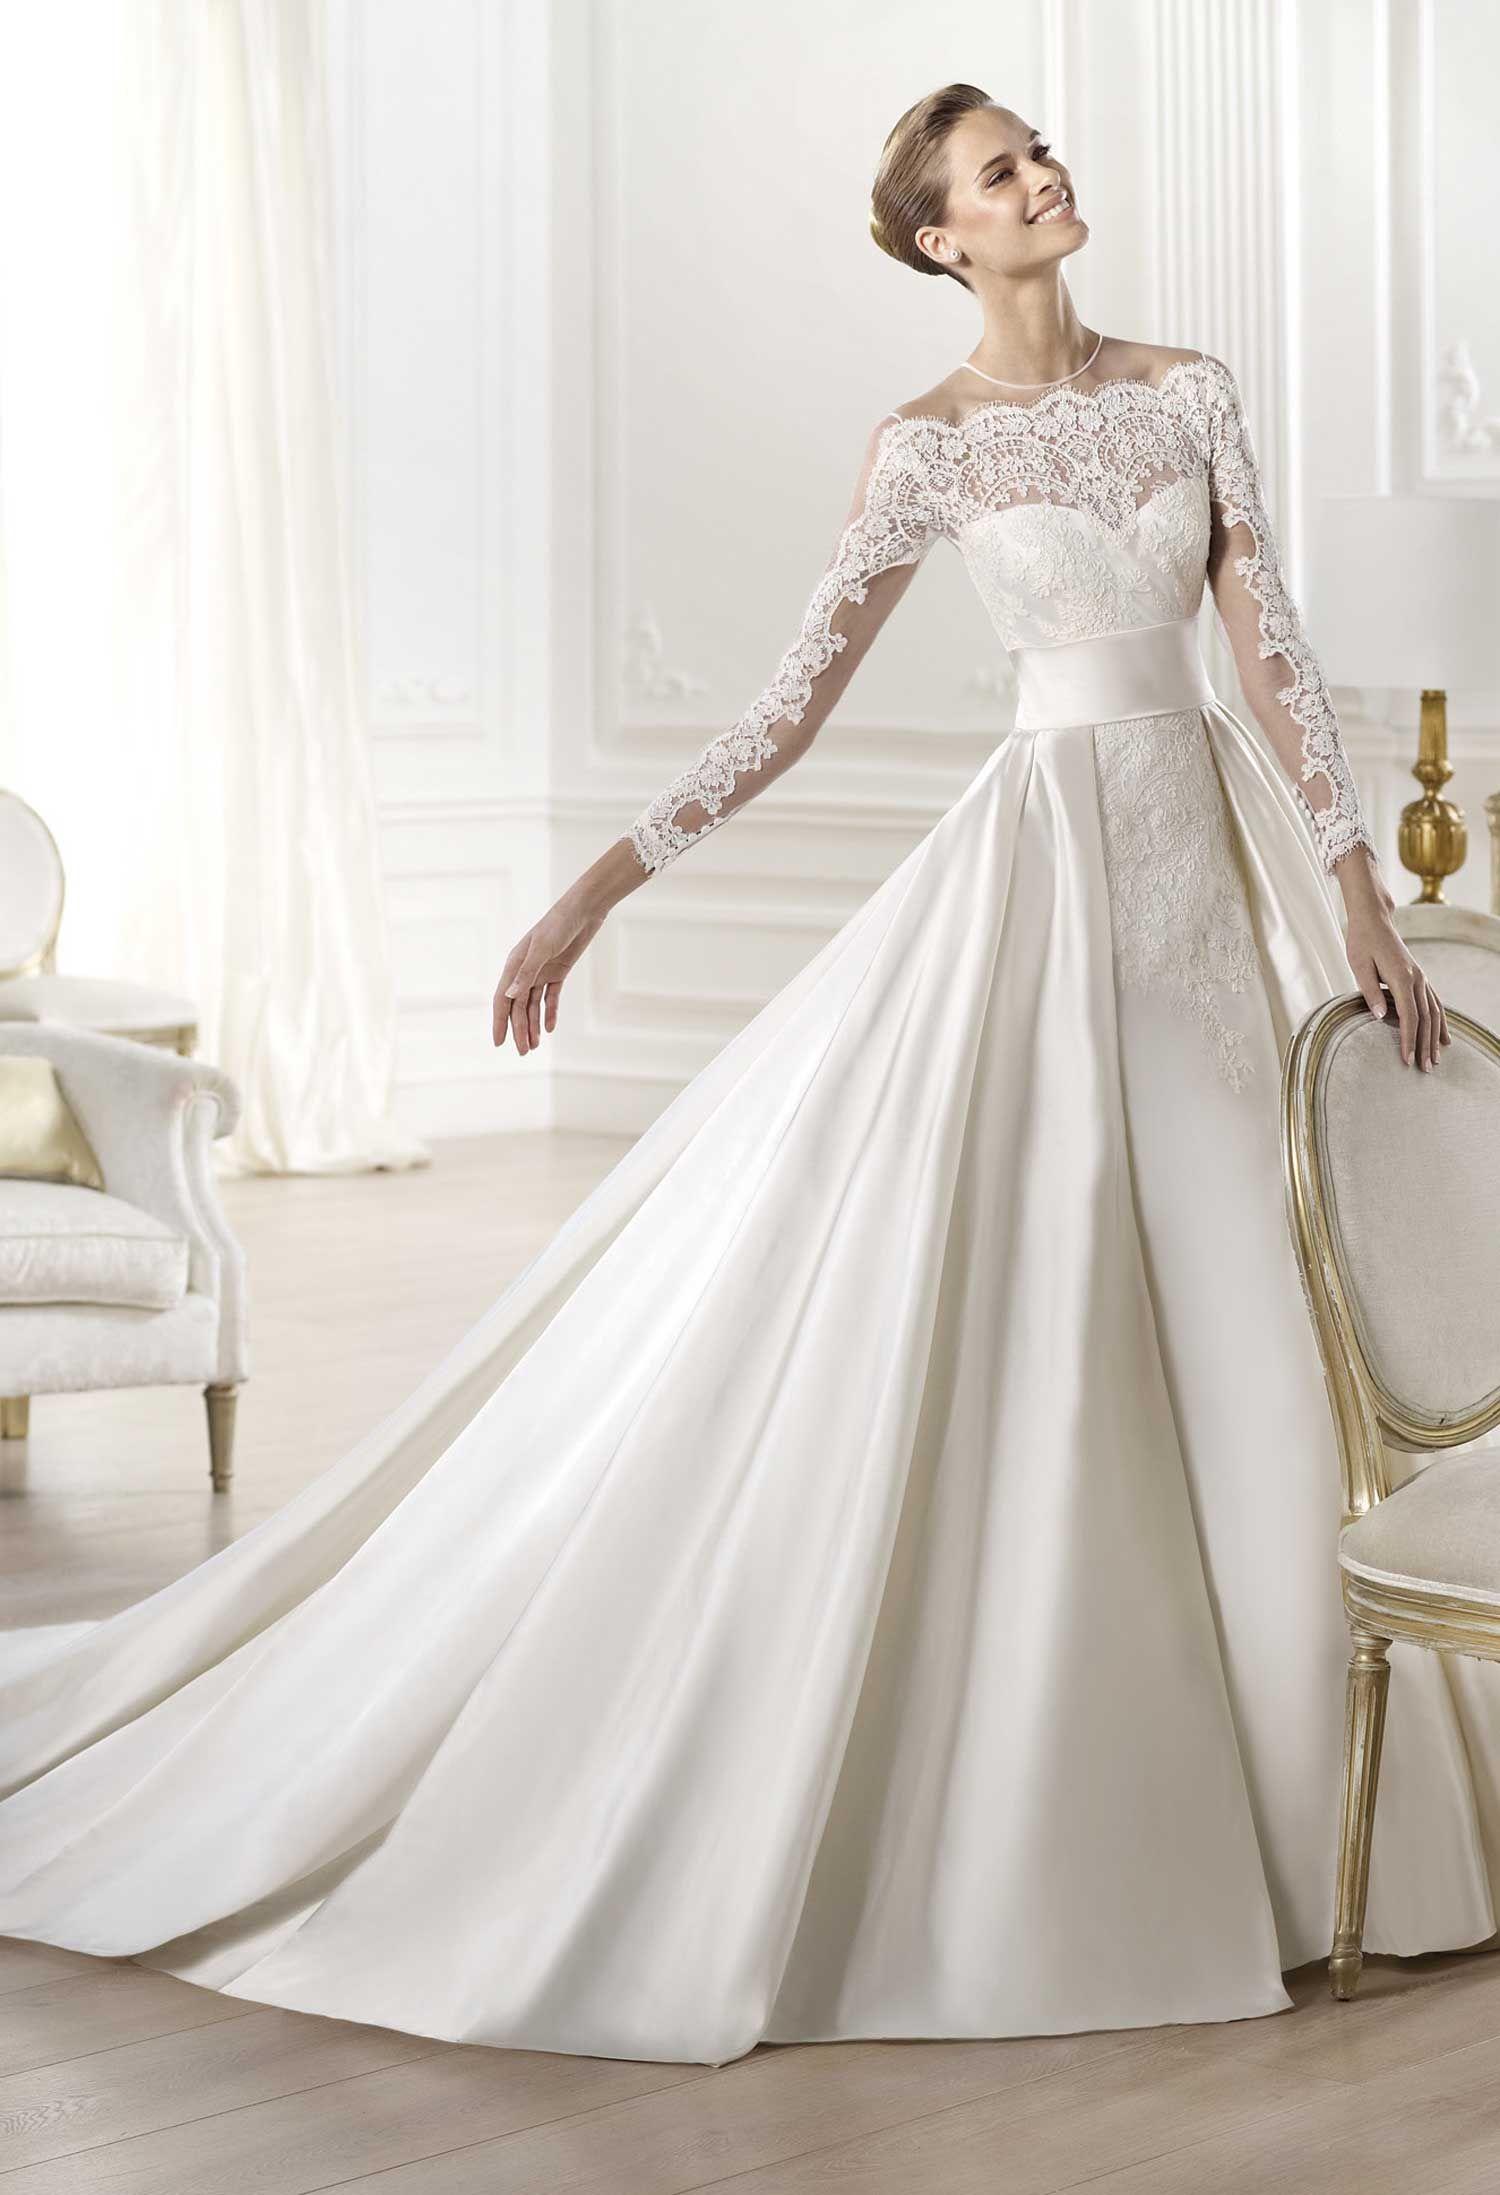 73cceb085d49 Stilisti abiti da sposa torino